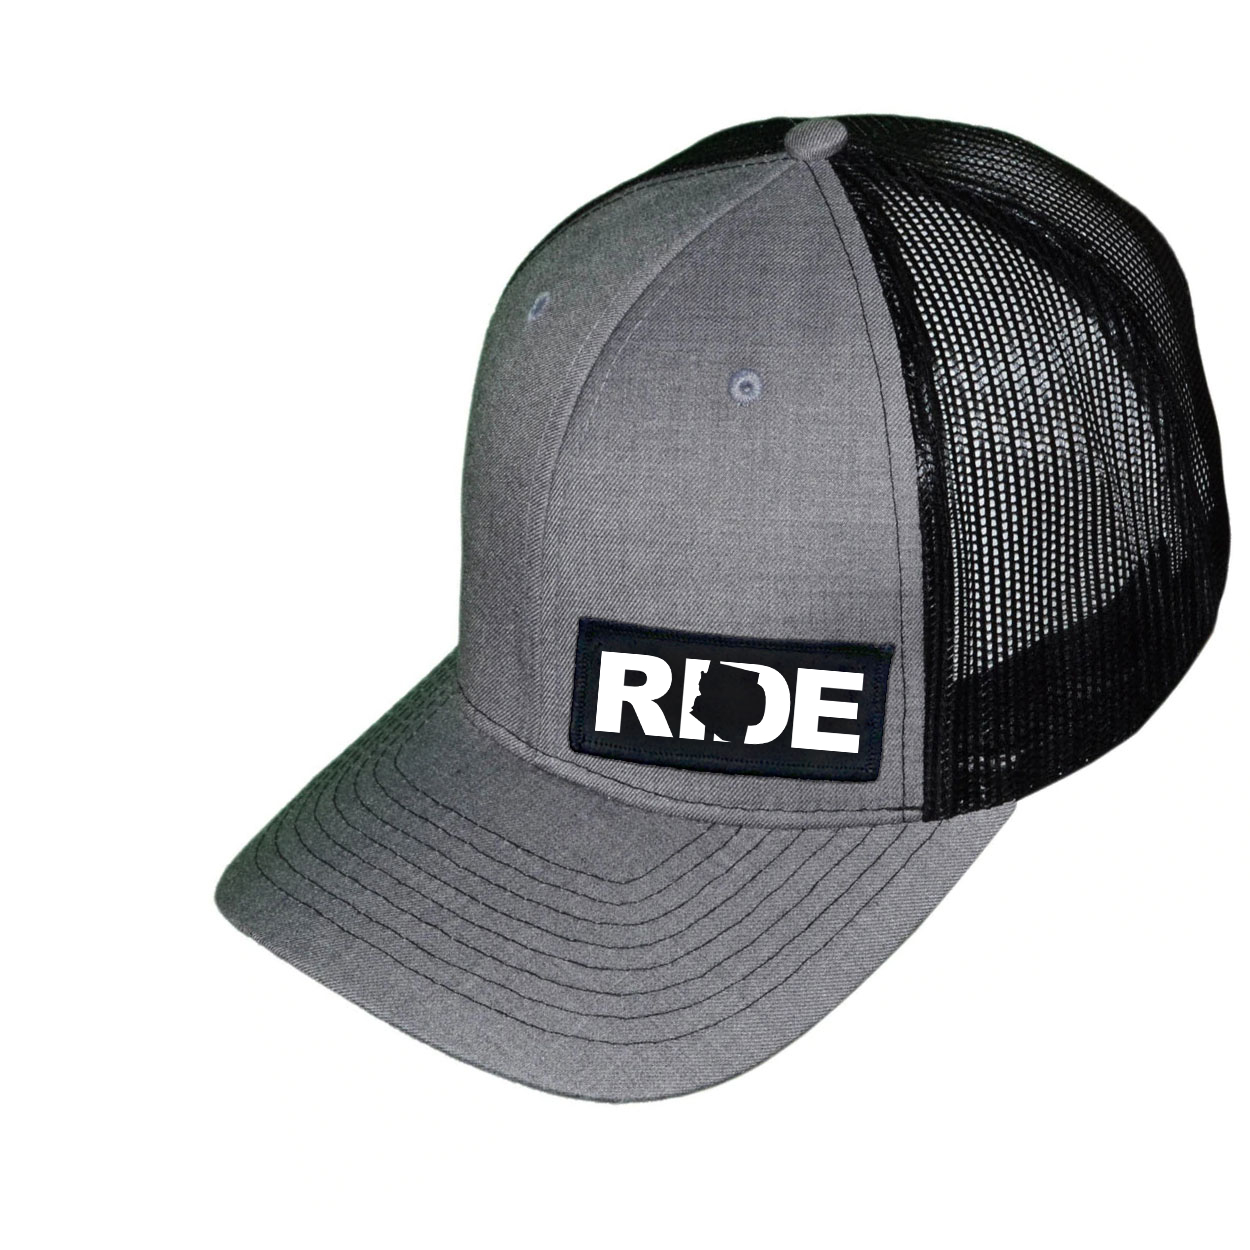 Ride Arizona Night Out Woven Patch Snapback Trucker Hat Heather Gray/Black (White Logo)